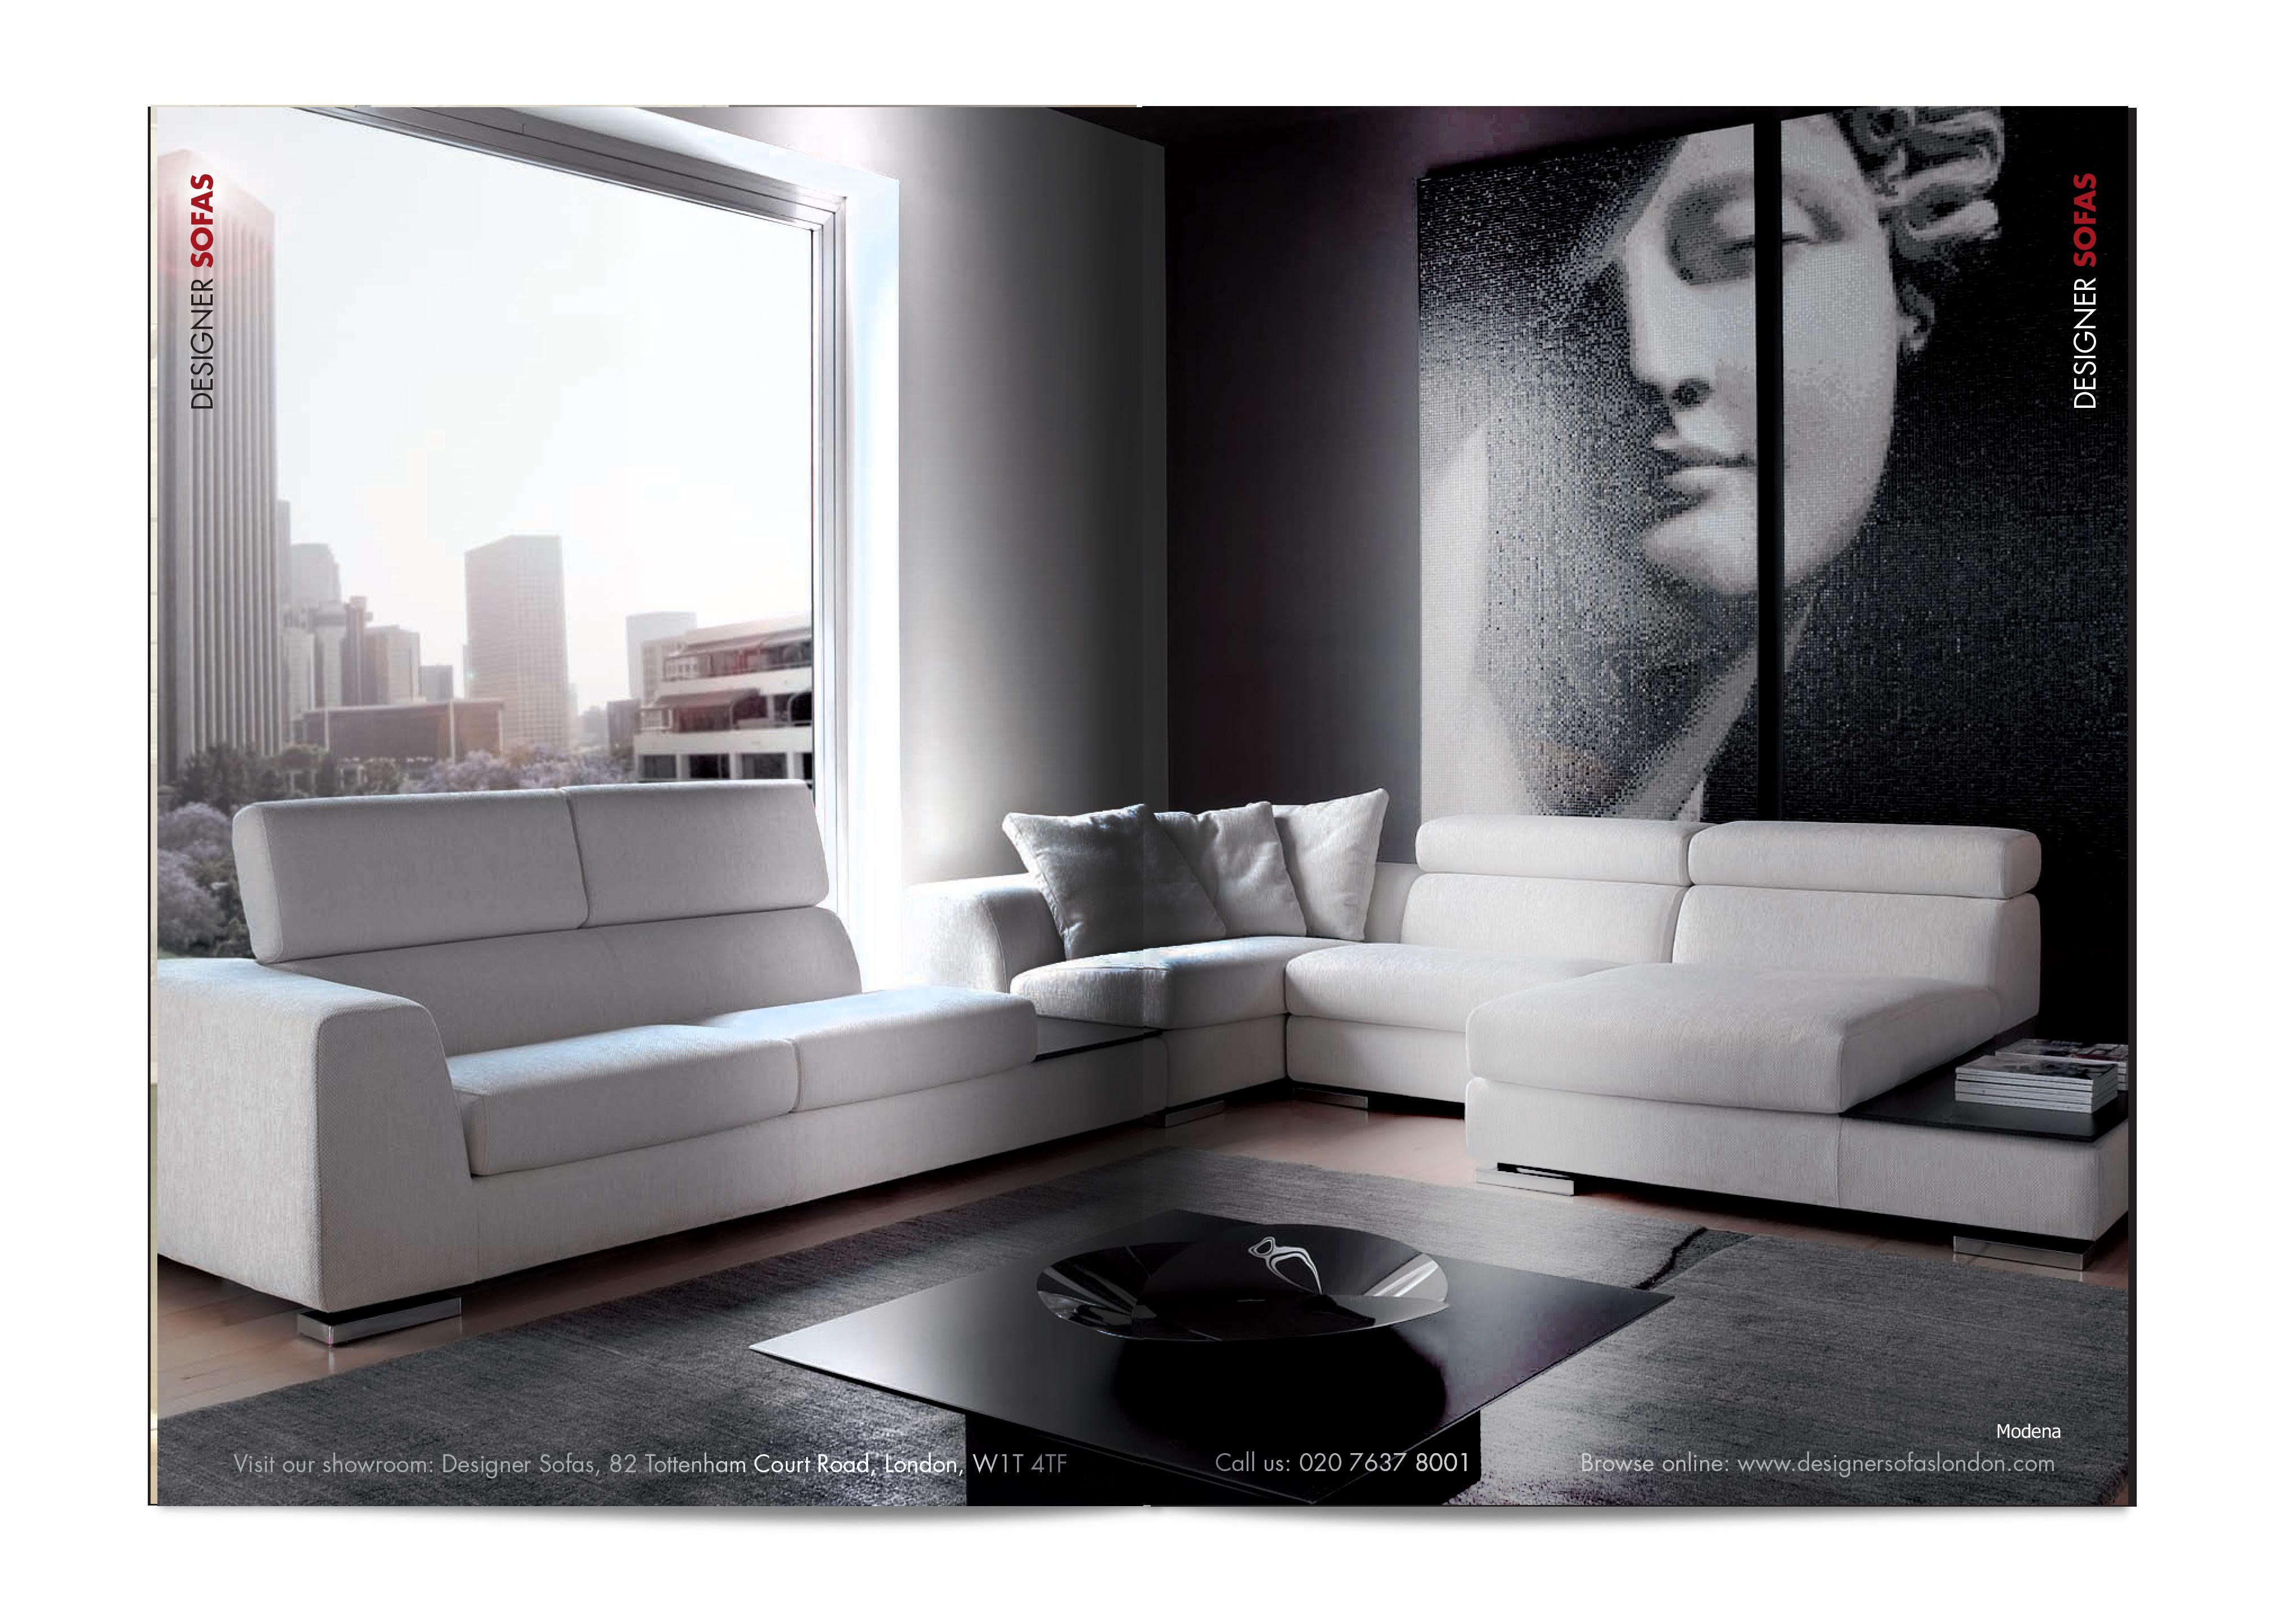 Designer Sofas Brochure